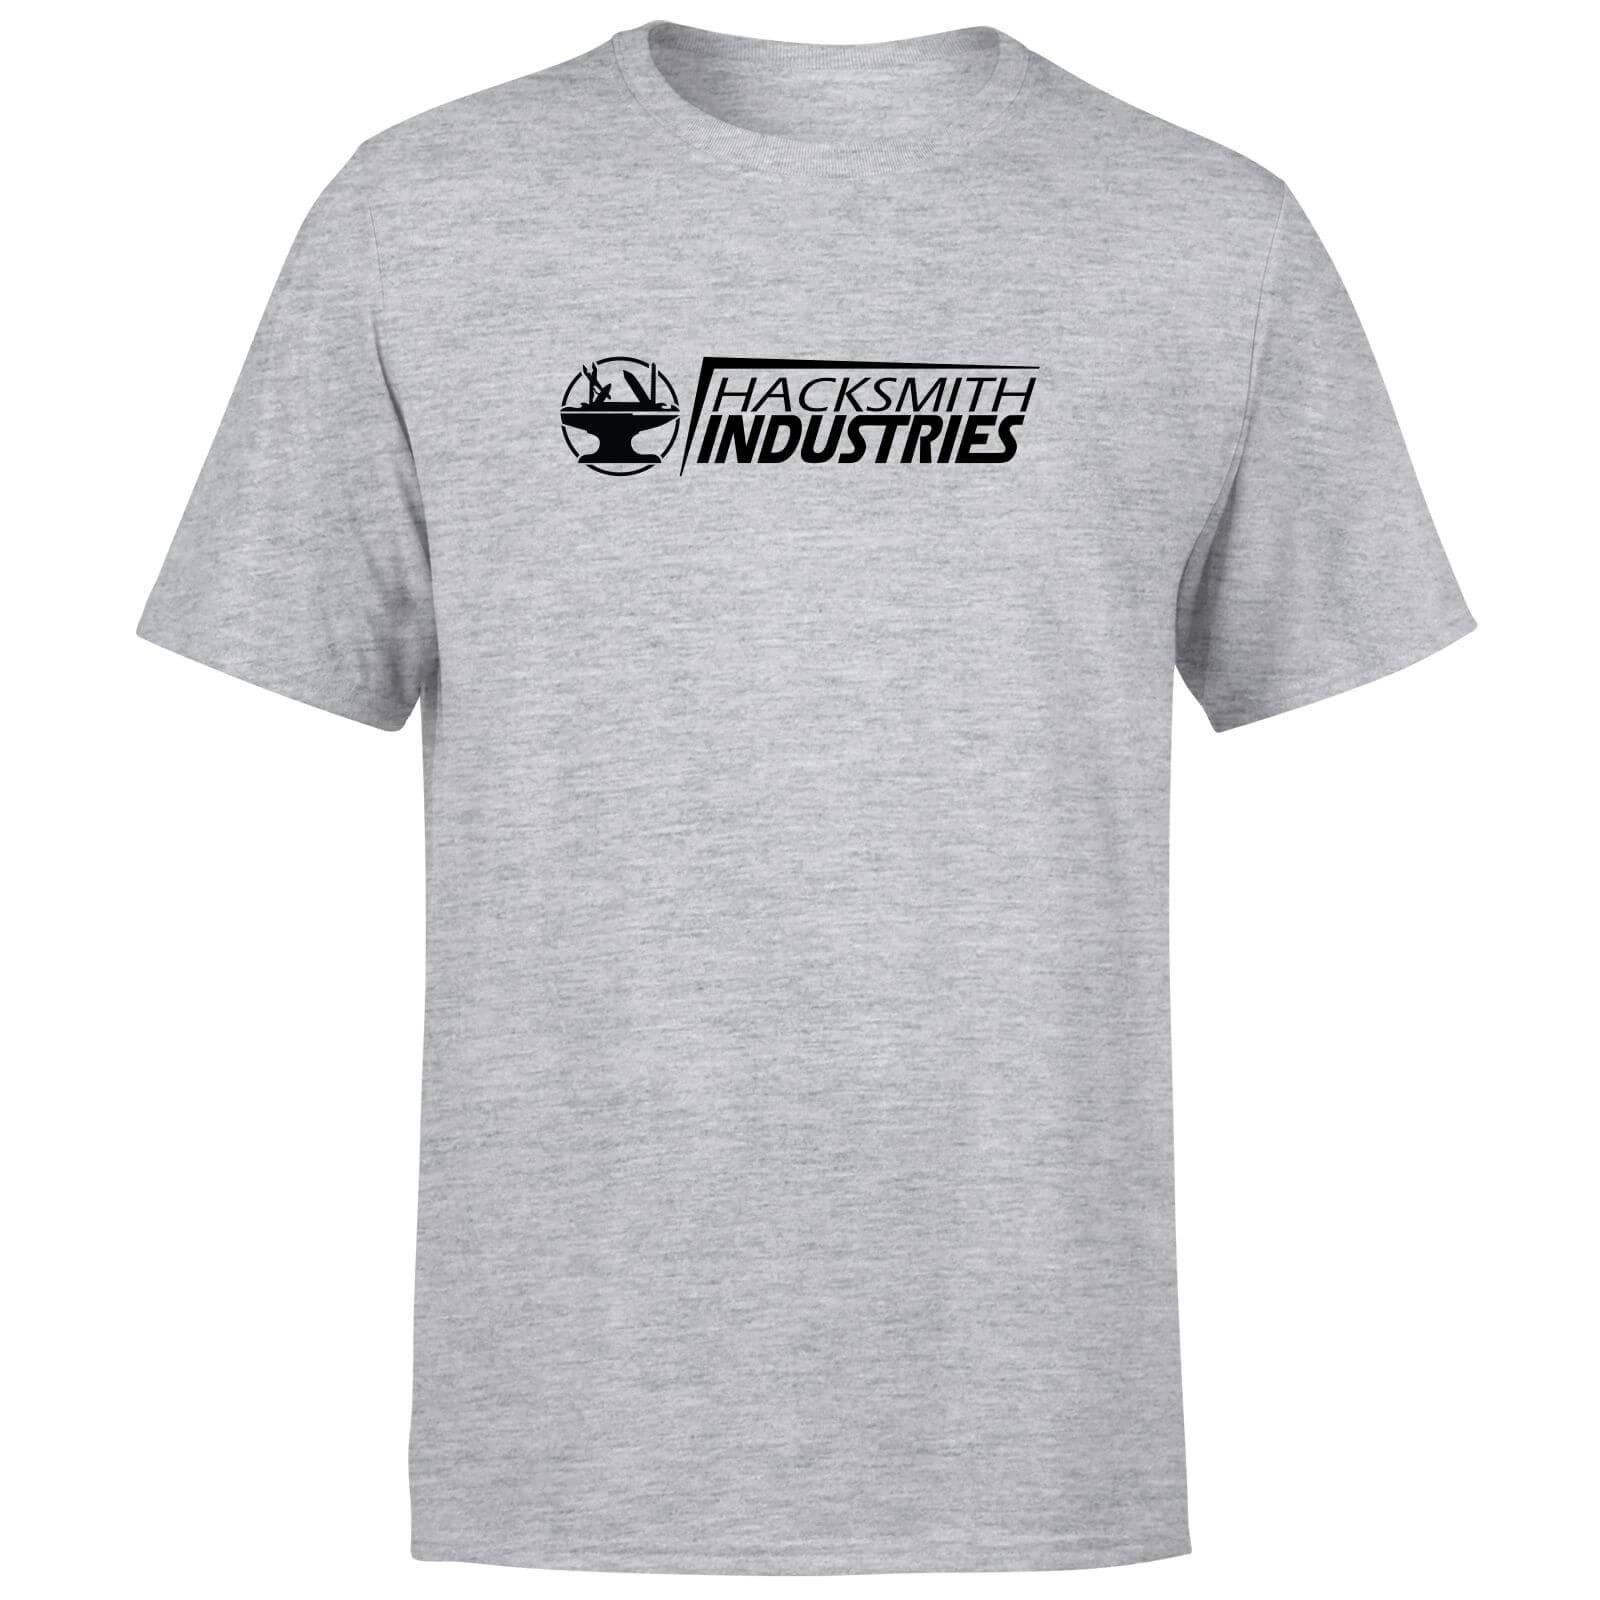 Hacksmith Industries Title T-Shirt - Grey - XS - Grey